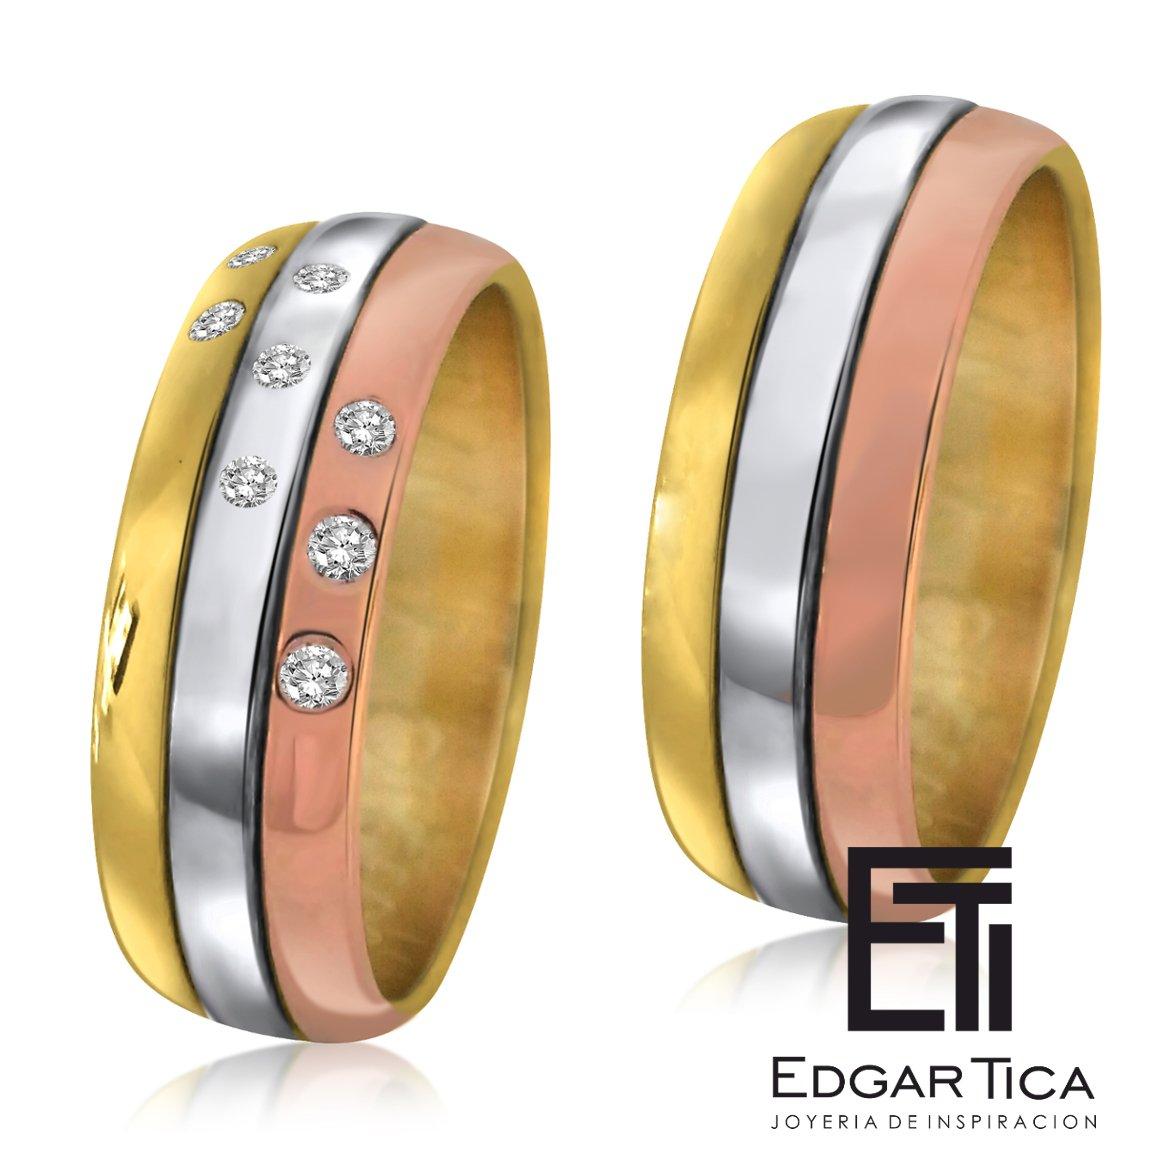 Anillos de matrimonio de oro blanco, oro rosado y oro amarillo 18k